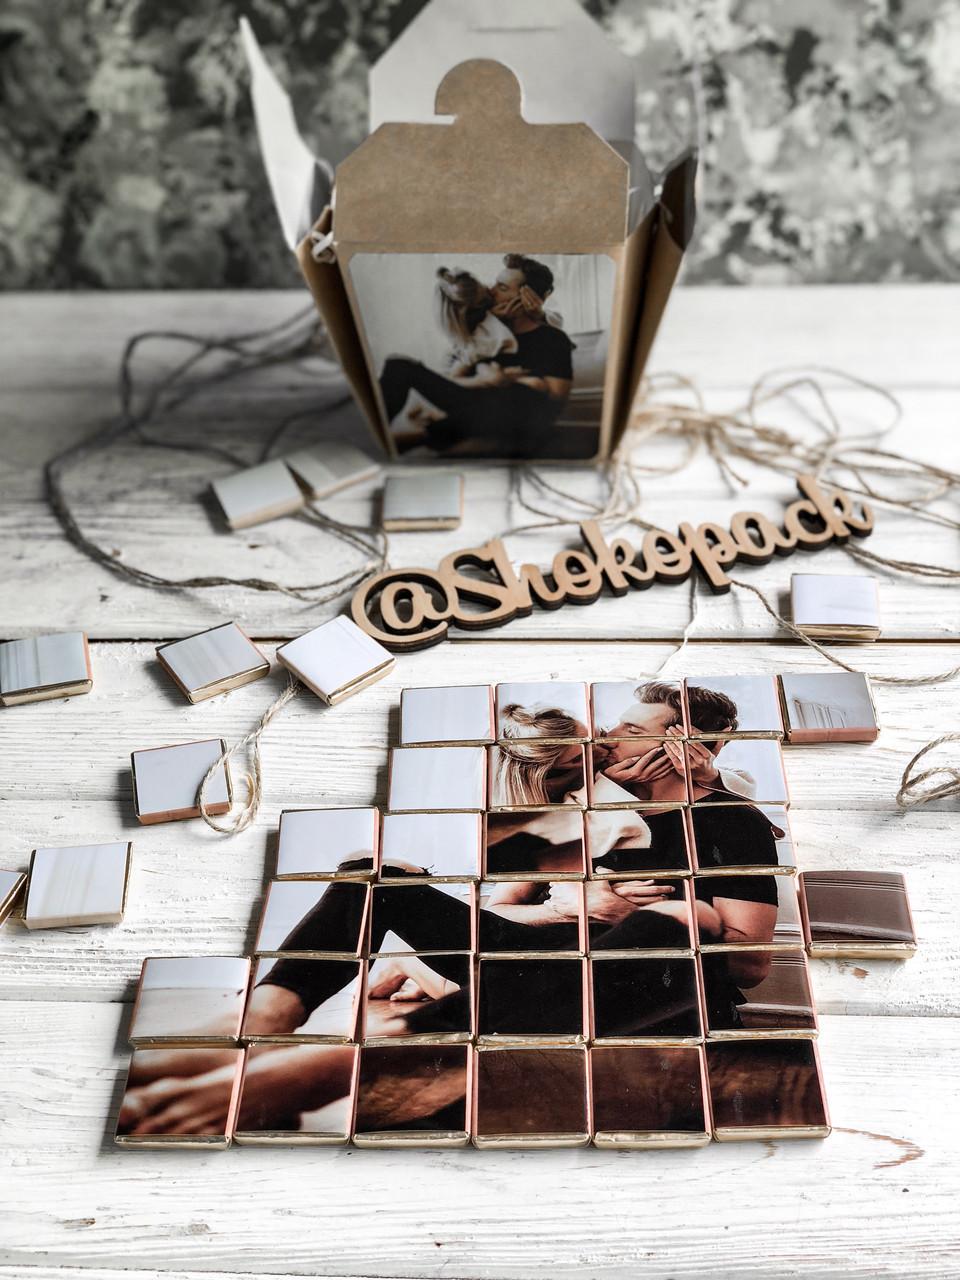 Шоколадный набор с фото Shokopack Хеппи Пазл 48 шк Молочный